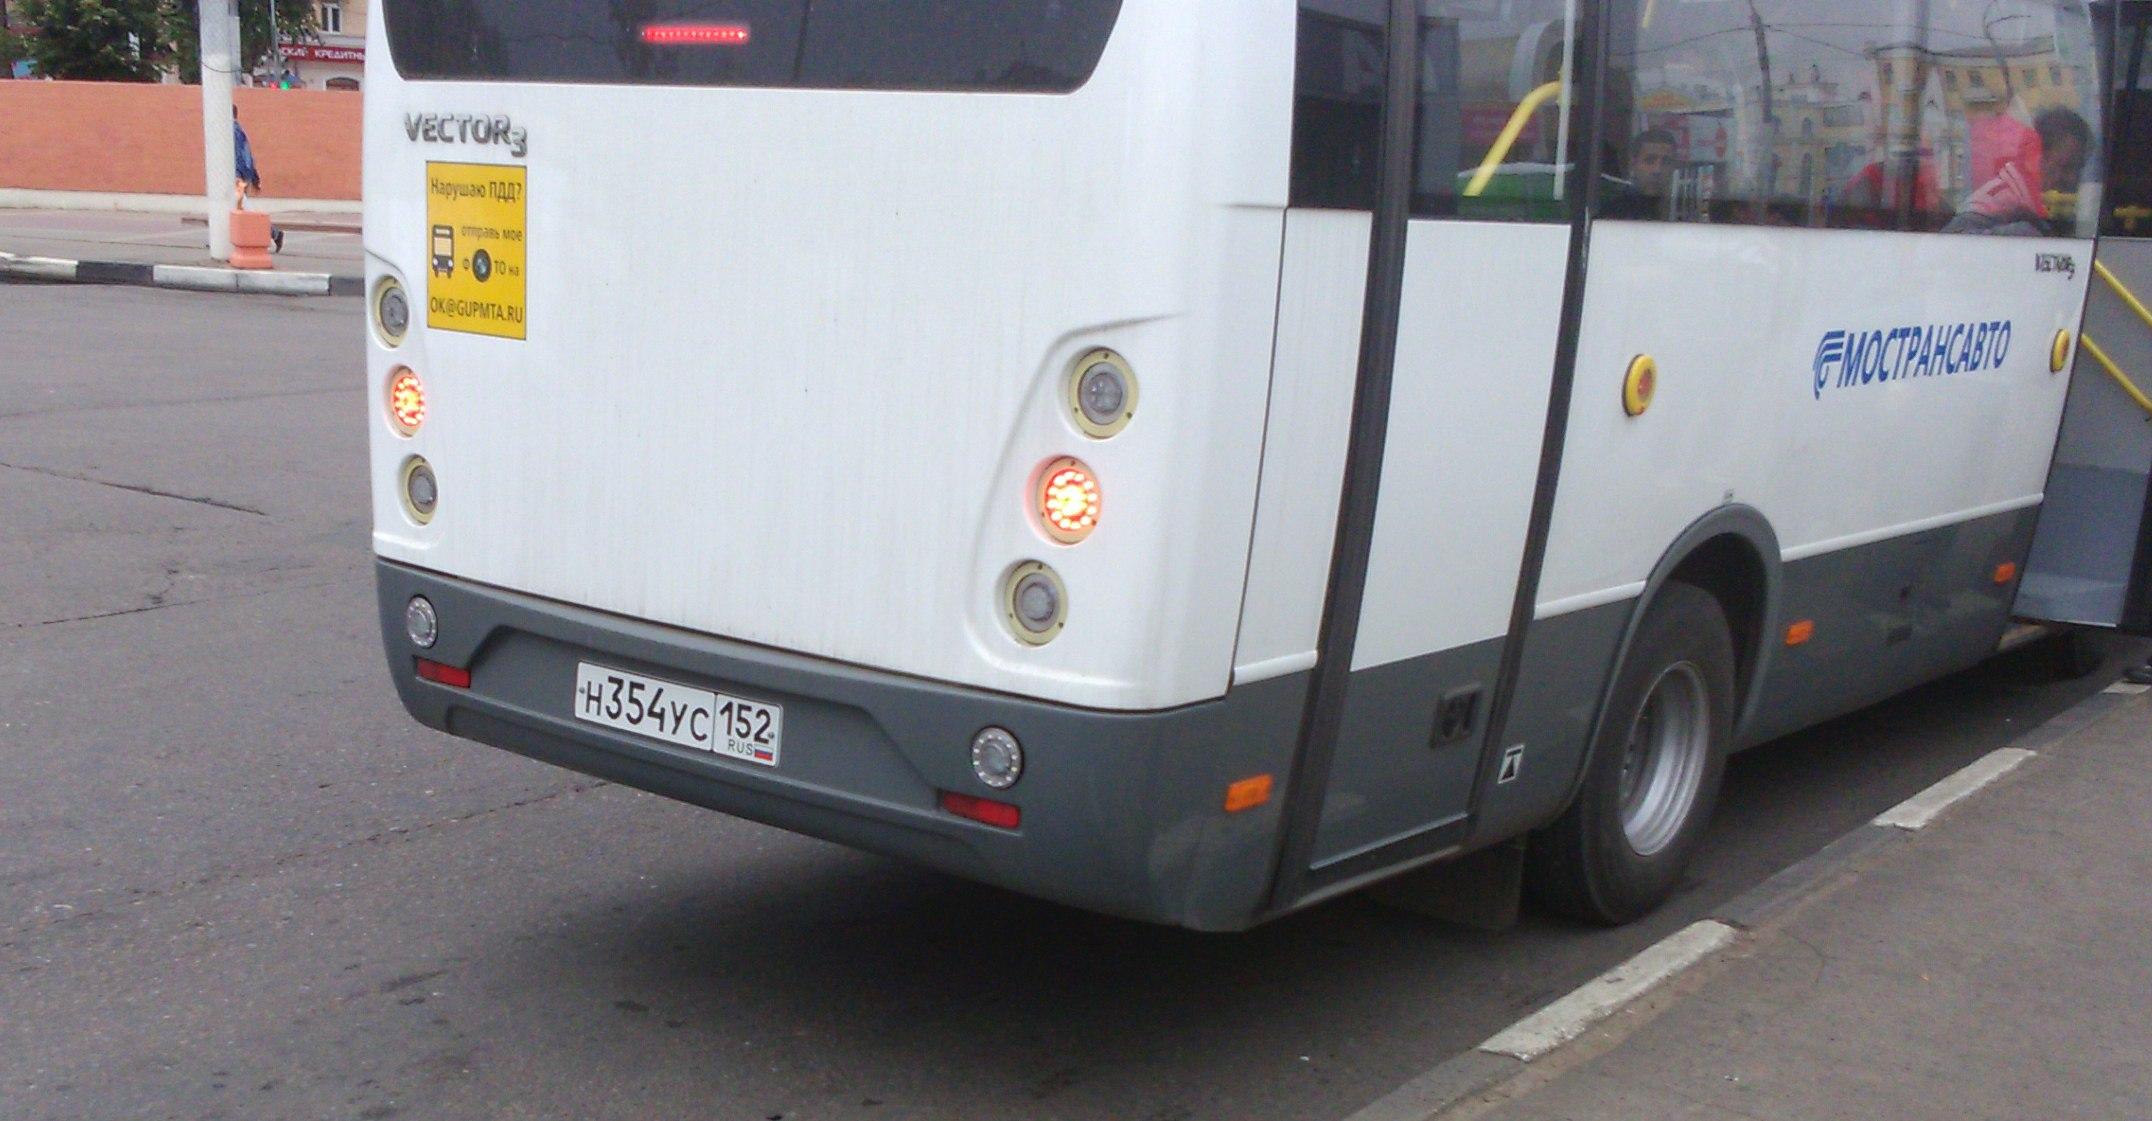 Jb6P78hEI9o.jpg